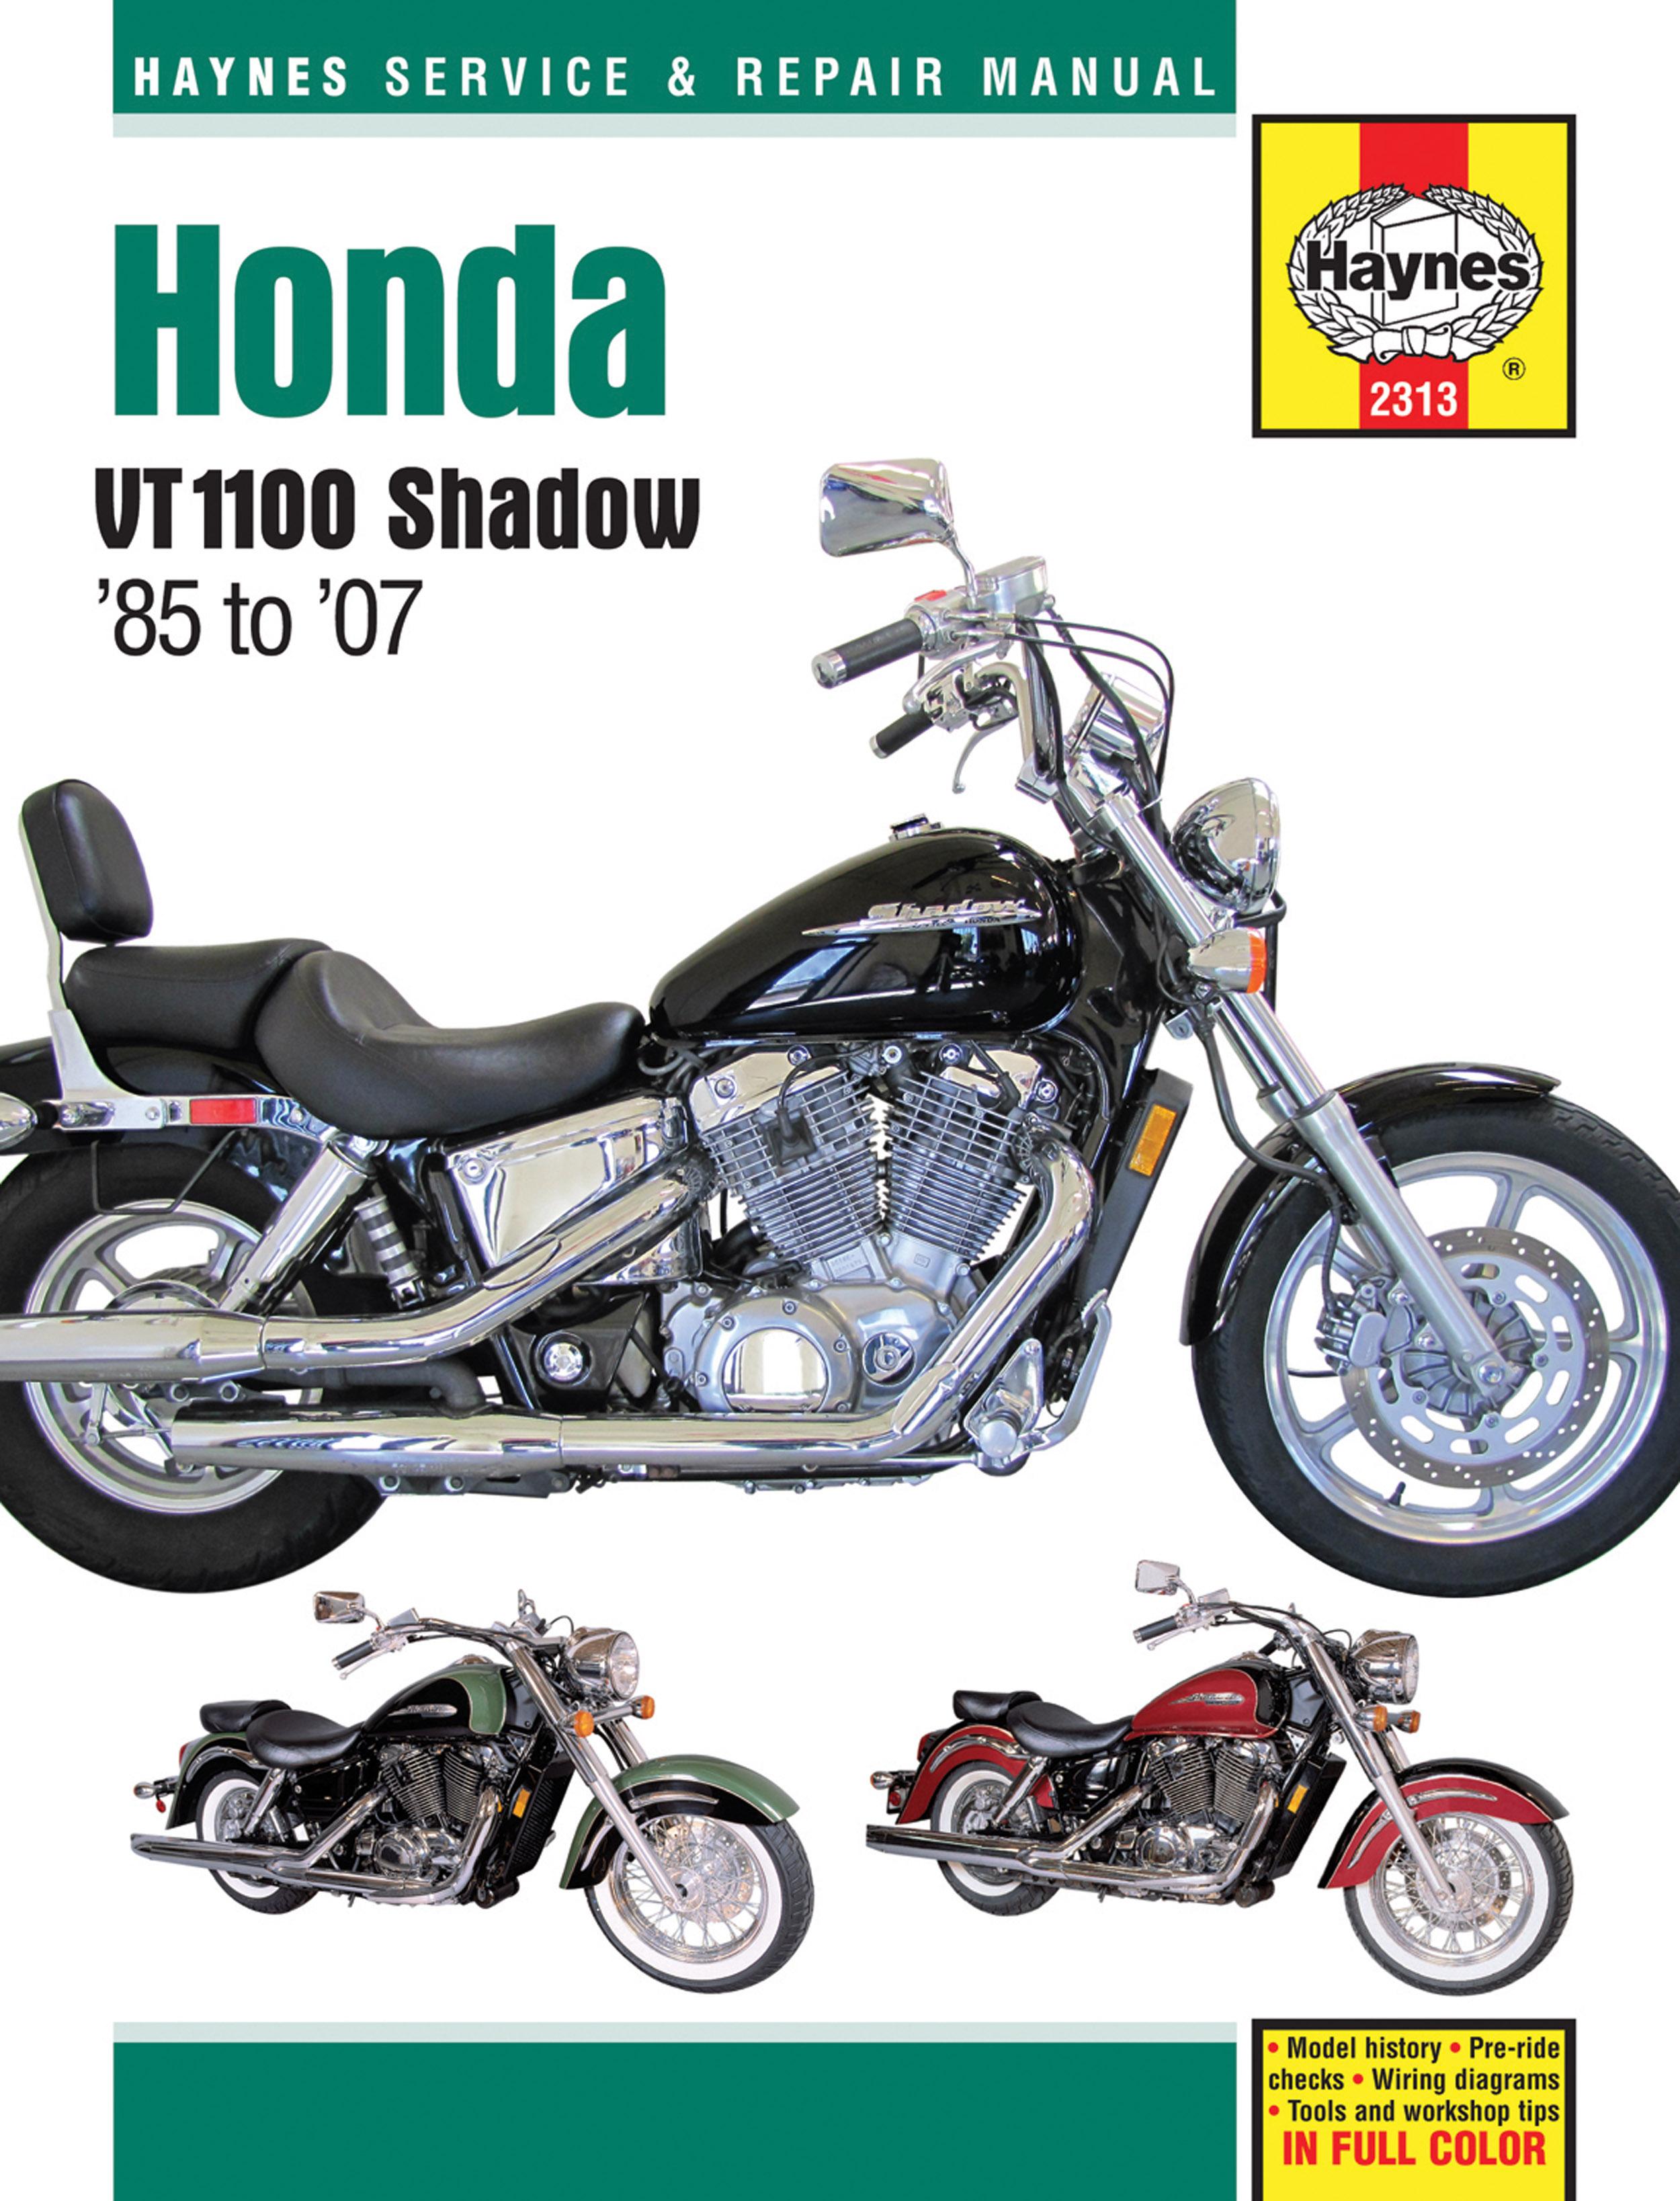 motorcycle honda shadow wiring diagram wm 7617  honda shadow aero wiring diagram  wm 7617  honda shadow aero wiring diagram